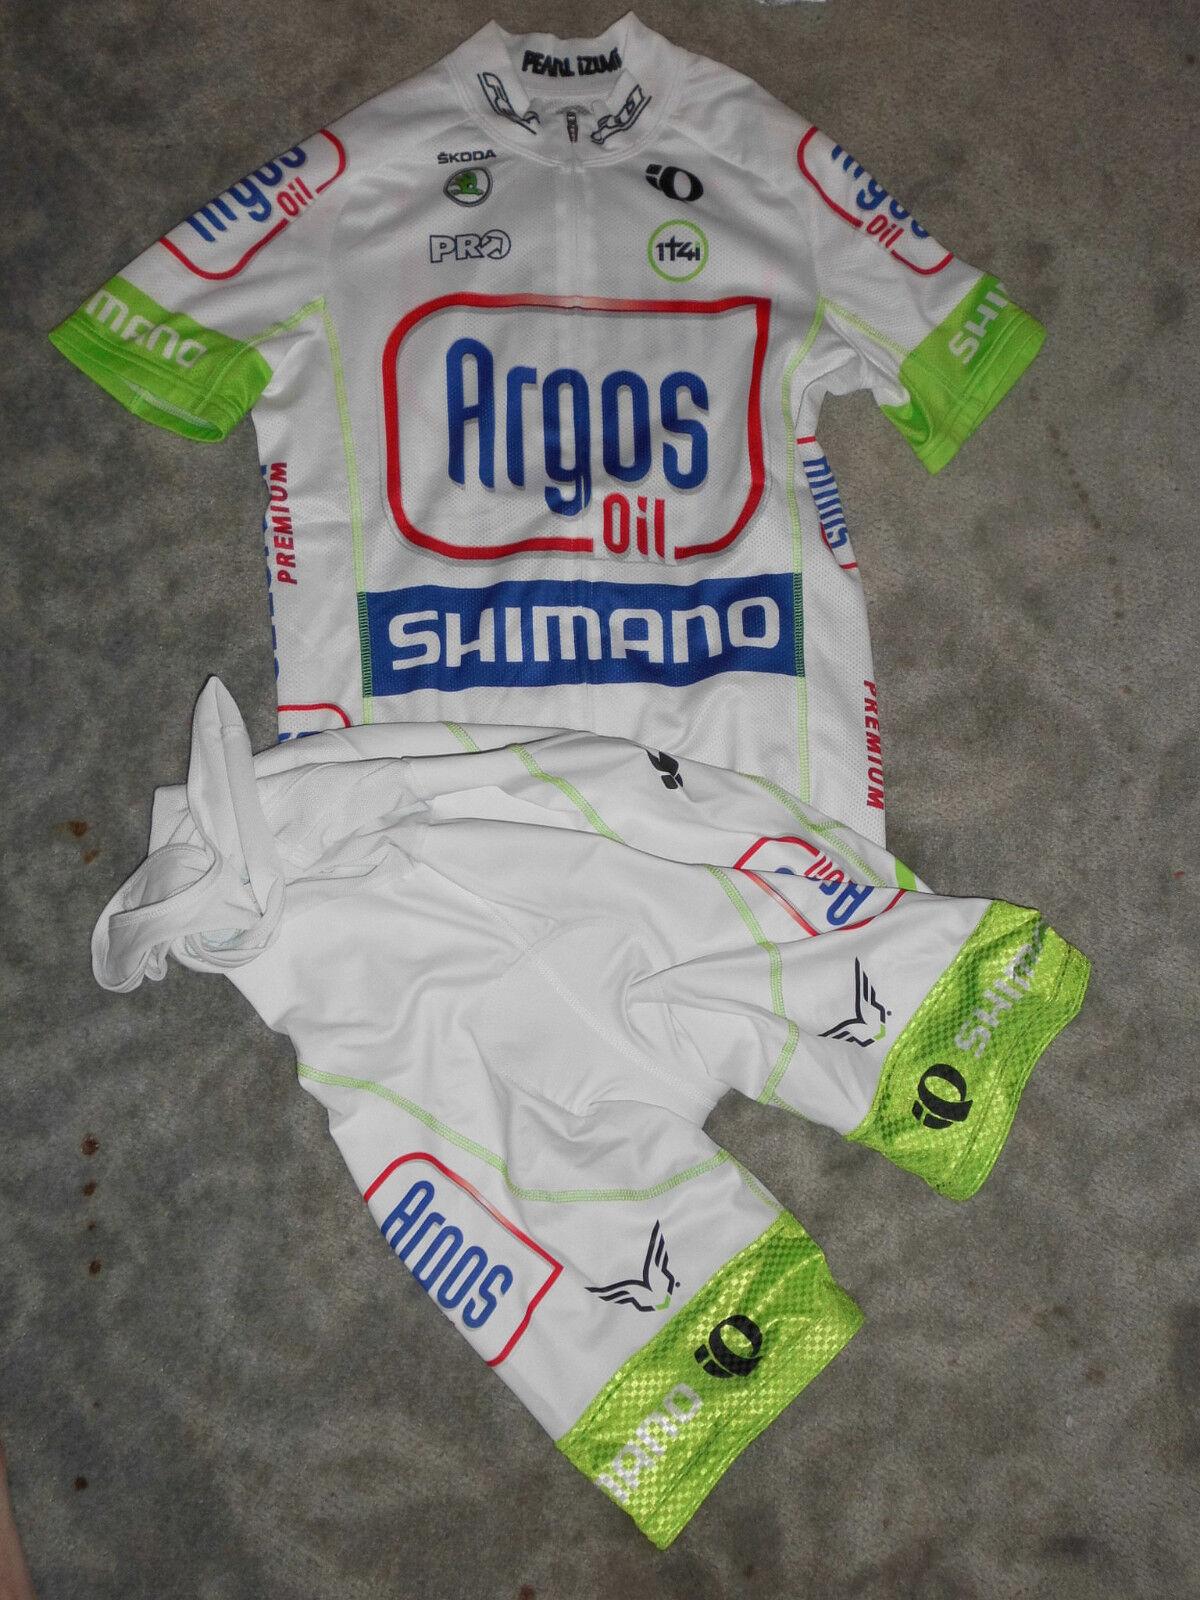 Original Pearl Izumi Team 1t4i 1t4i 1t4i Argos Shimano Climber Jersey & bib short 816201